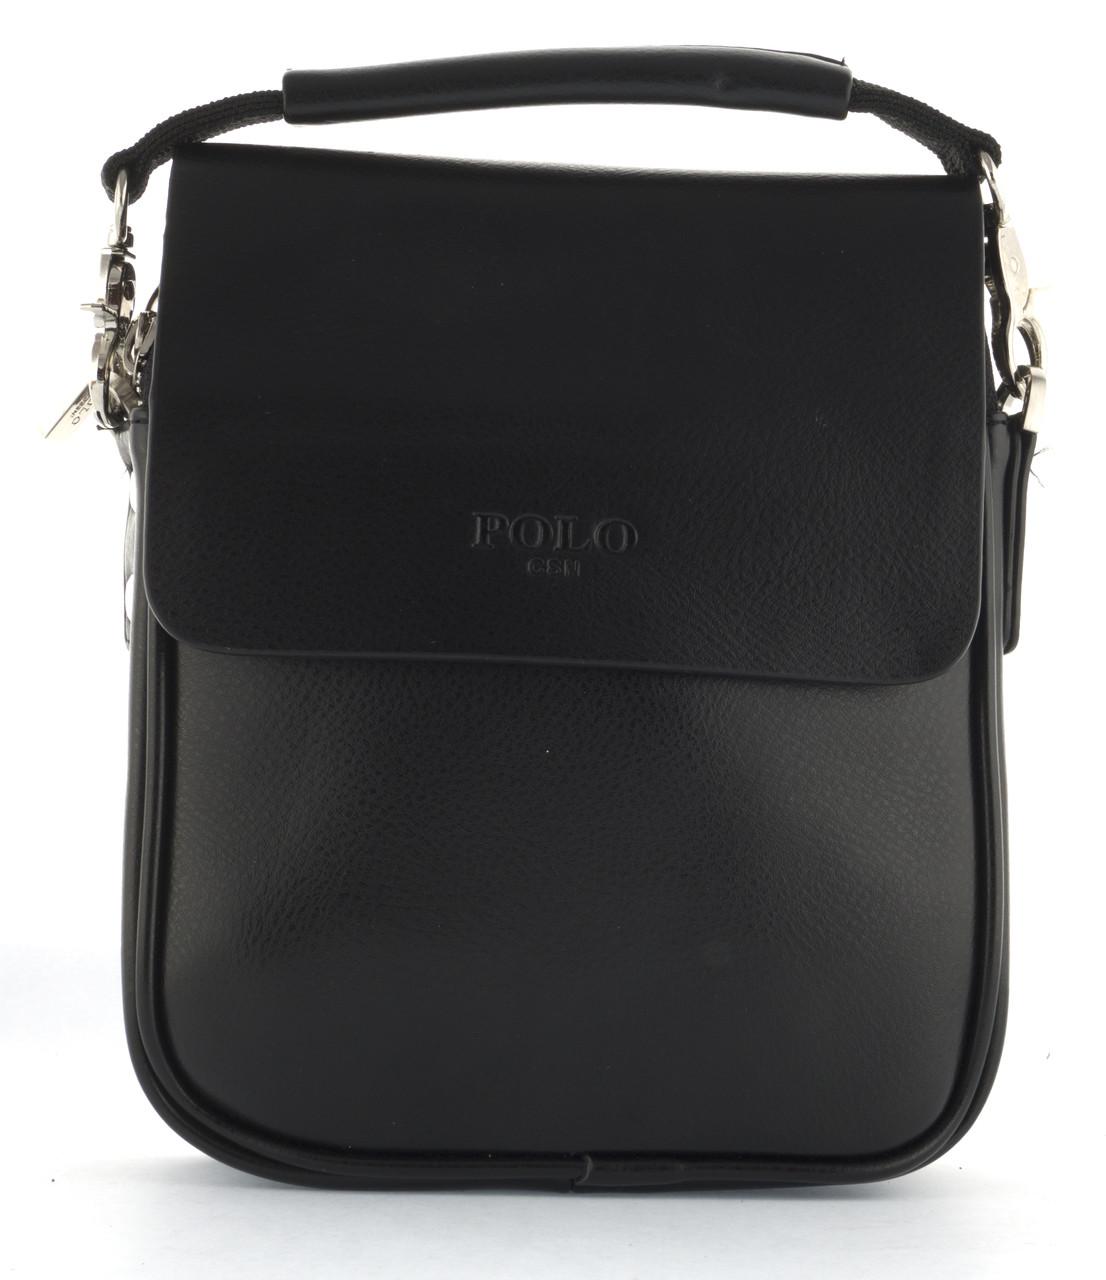 Зручна чоловіча стильна міцна сумка з якісно PU шкіри POLO art. B371-1 чорна